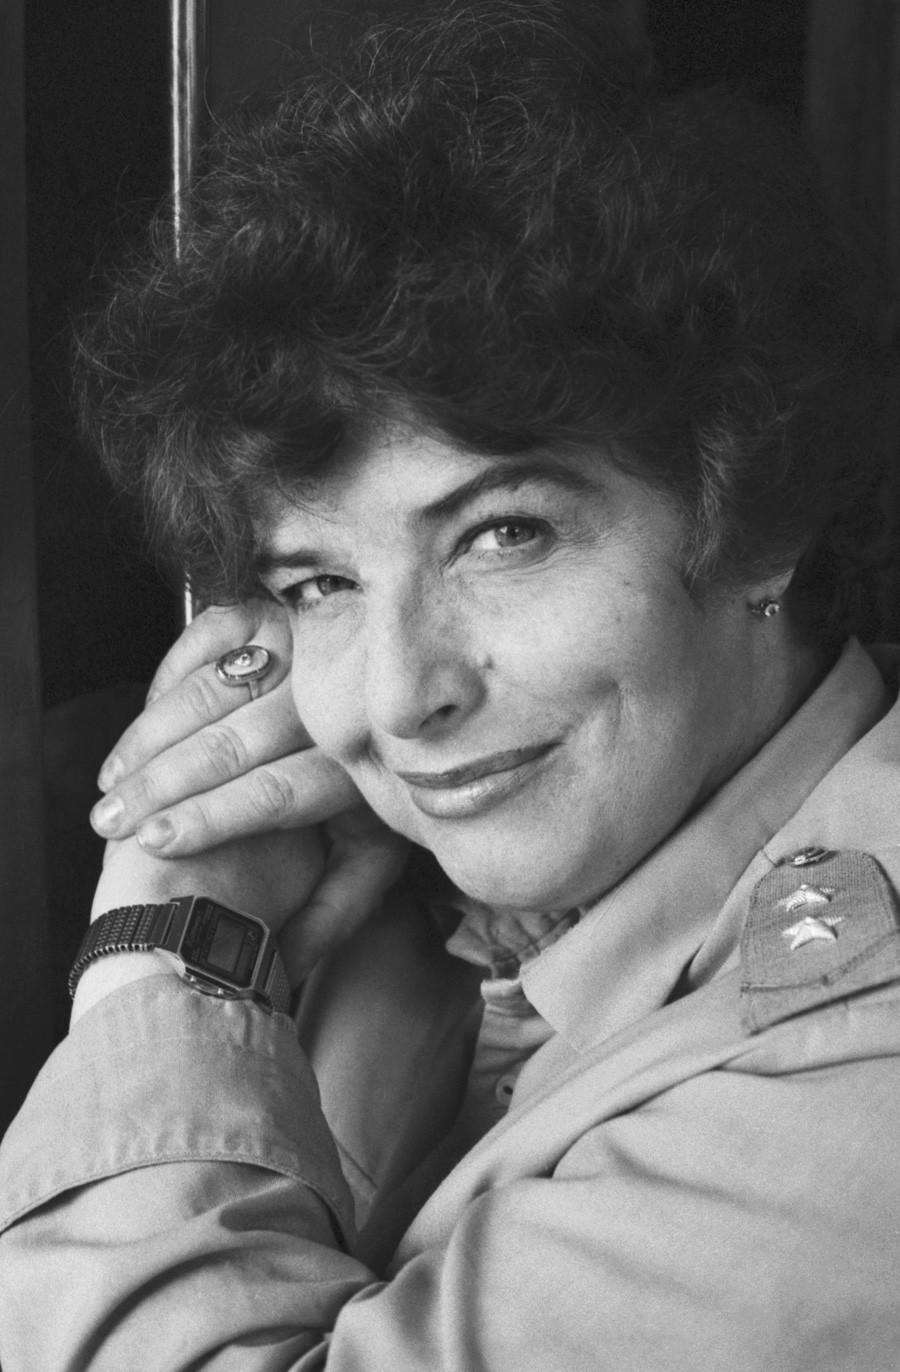 Машинист 1 класса Тамара Григорьевна Аранчий, кавалер ордена «Знак Почета». 8 июня 1989. г.